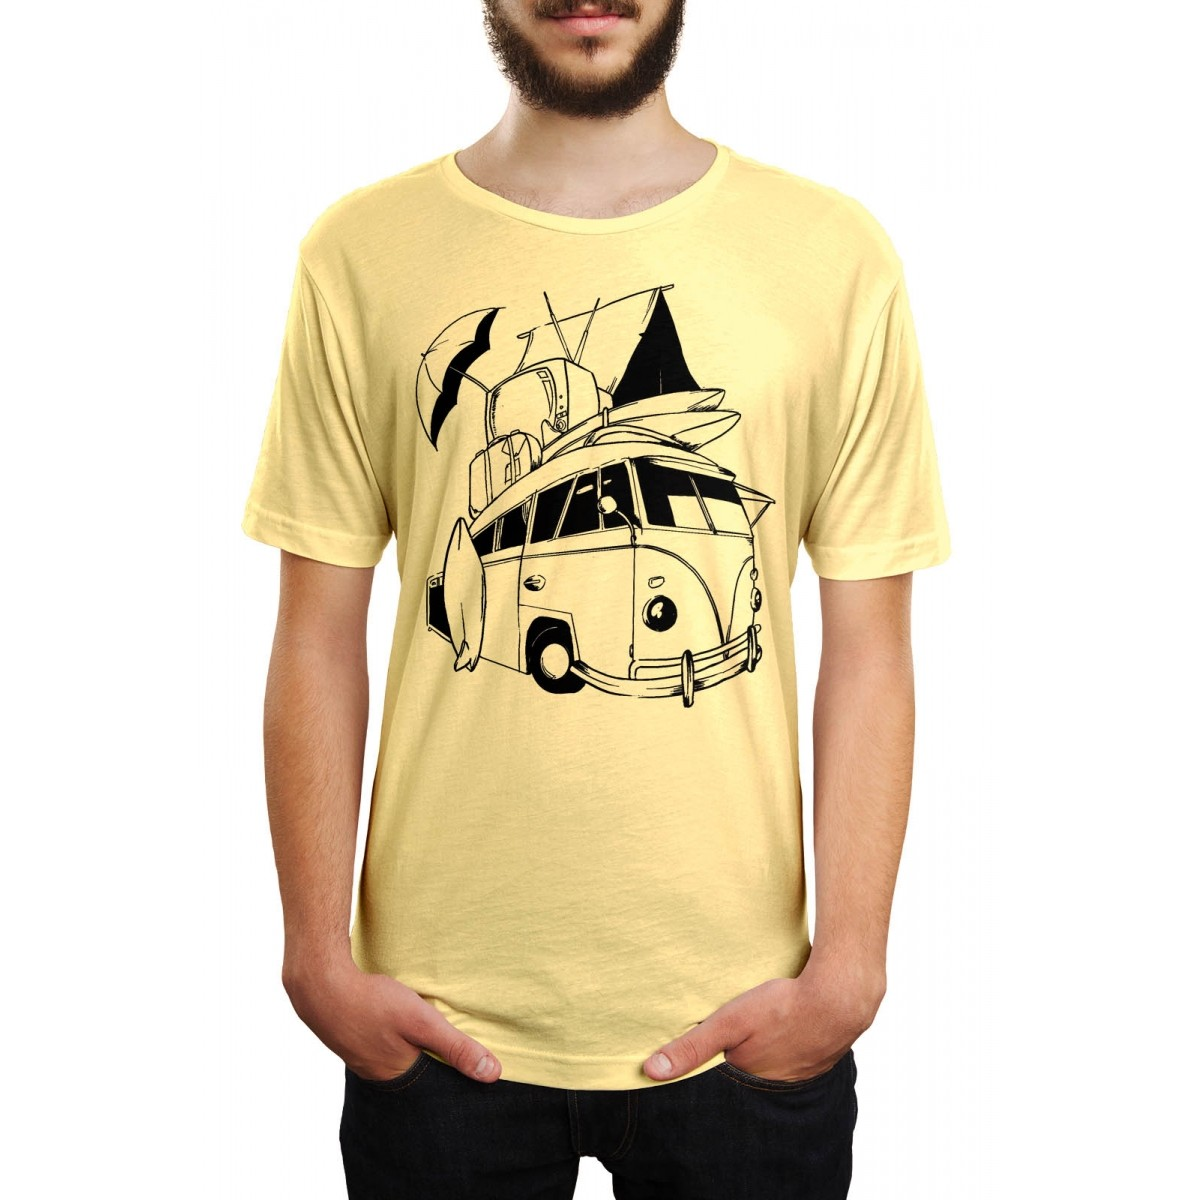 Camiseta HShop Kombi Amarelo  - HShop